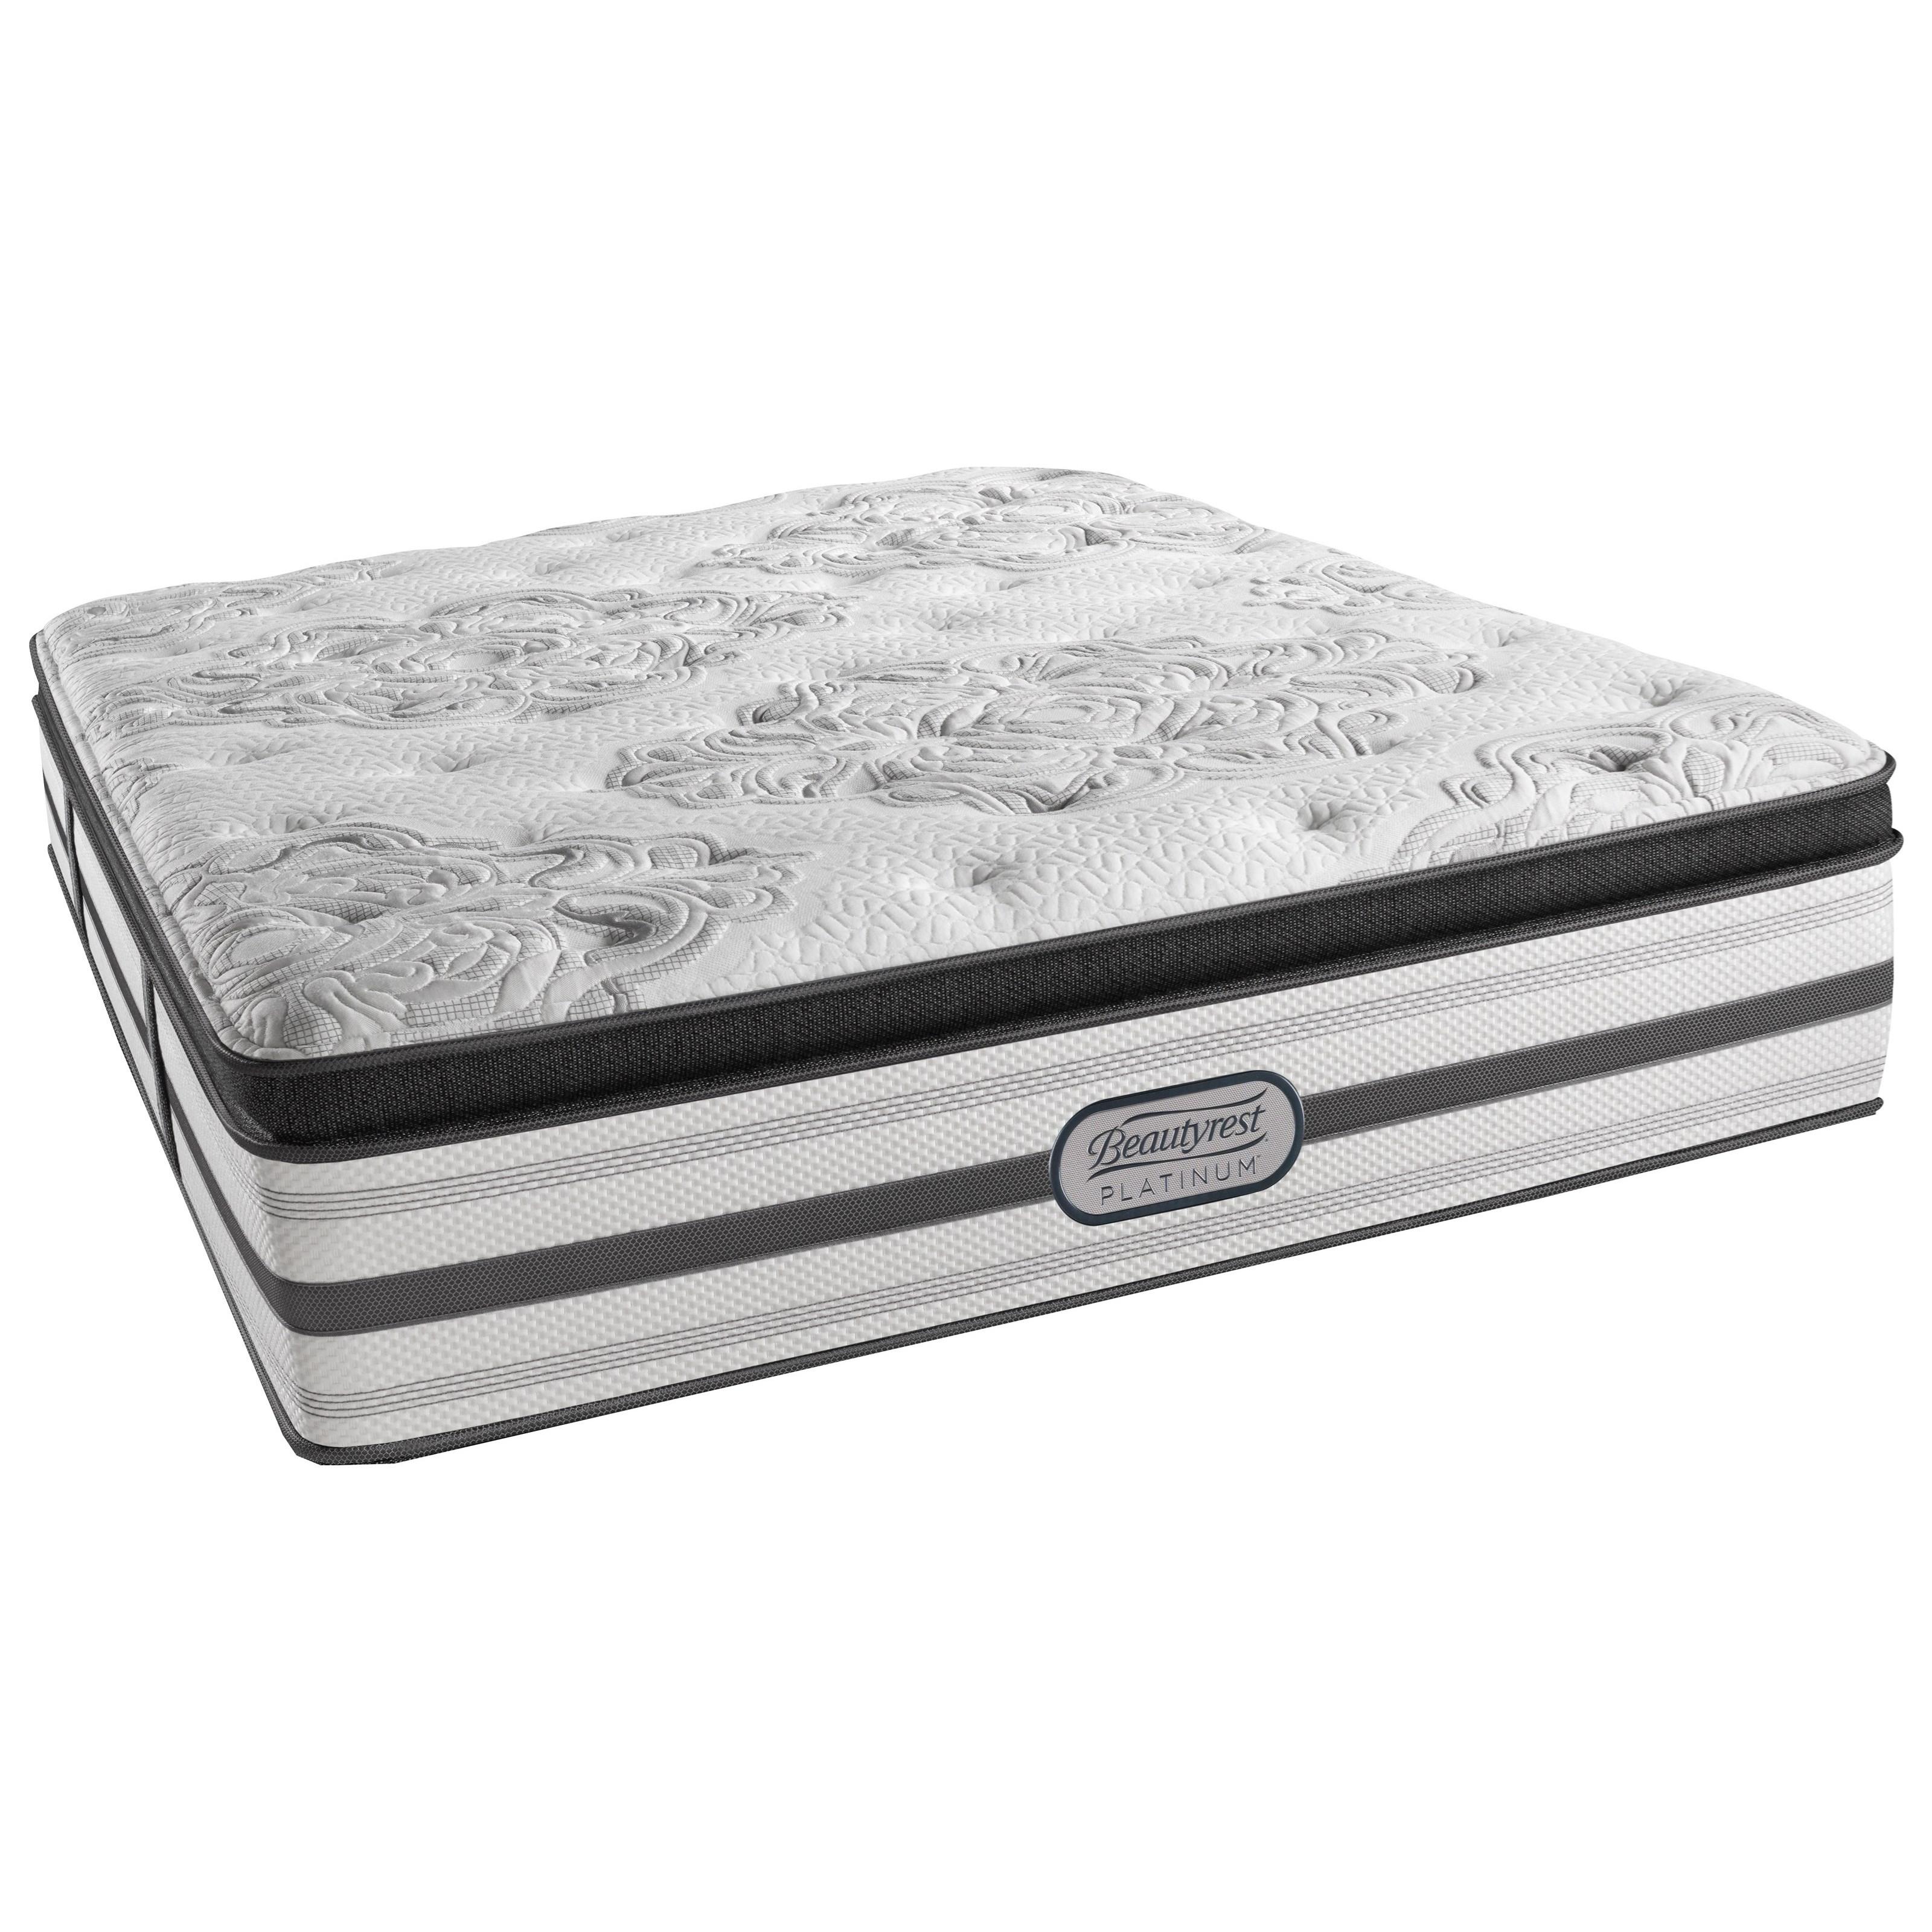 "Beautyrest Platinum Gabriella King Plush Pillow Top 15"" Mattress - Item Number: LV3PLPT-K"